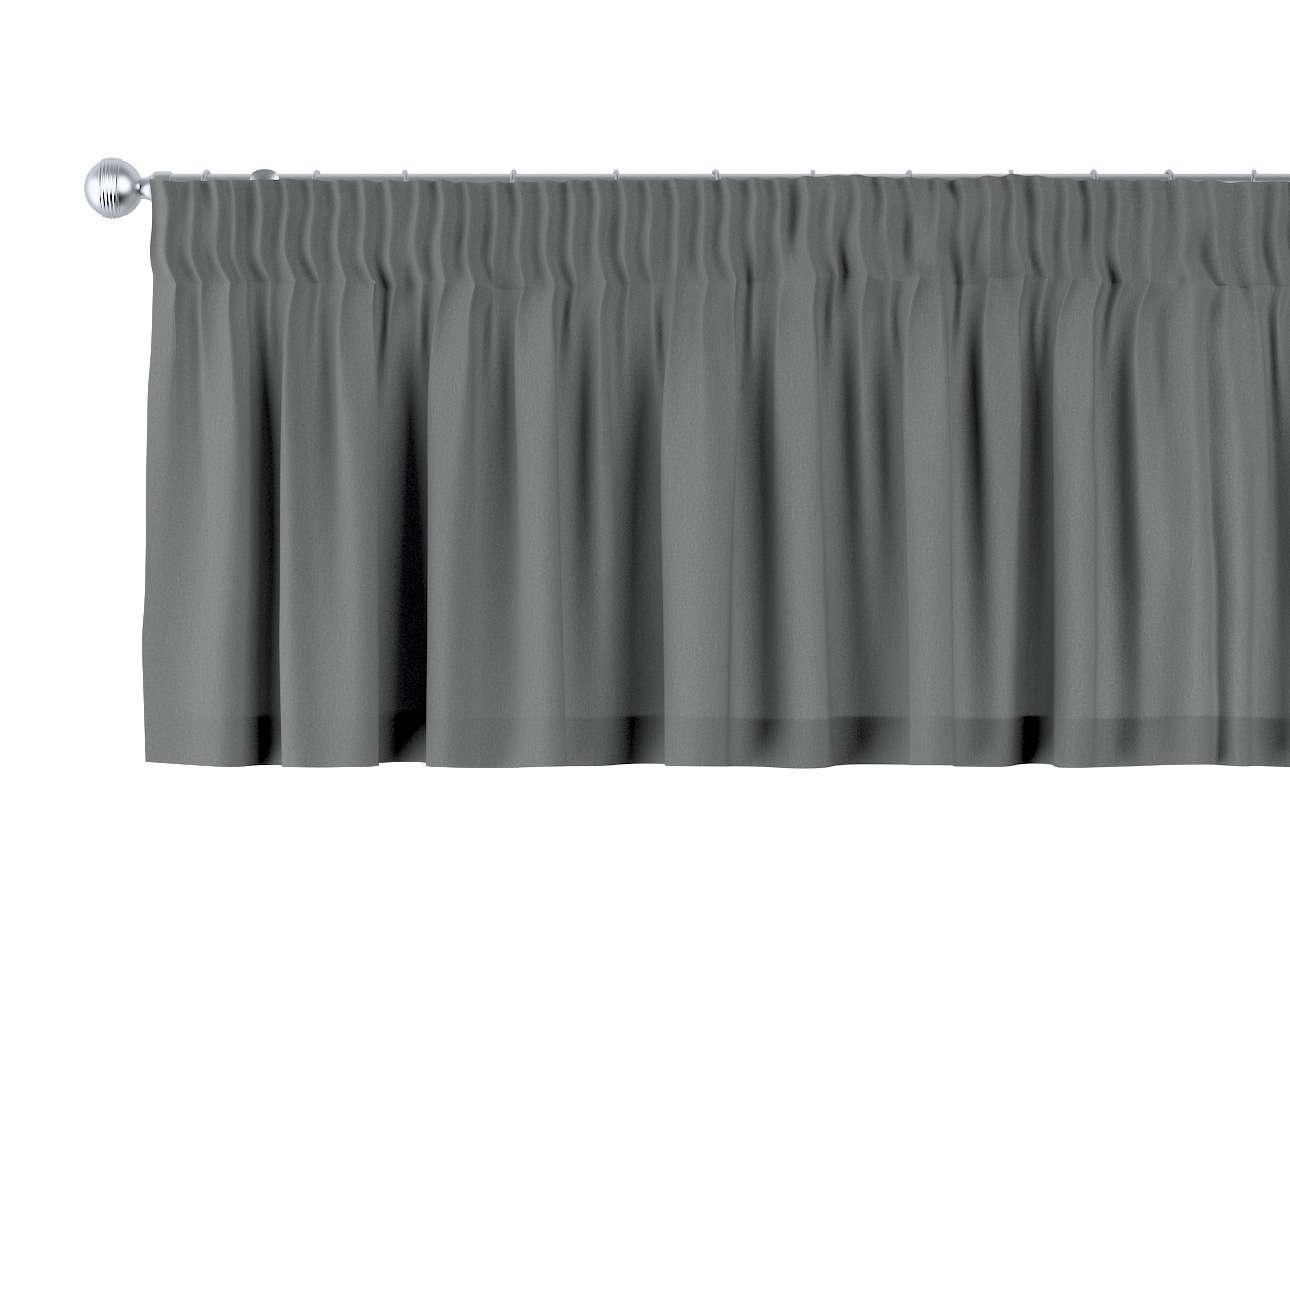 Kurzgardine mit Kräuselband 130 x 40 cm von der Kollektion Quadro, Stoff: 136-14